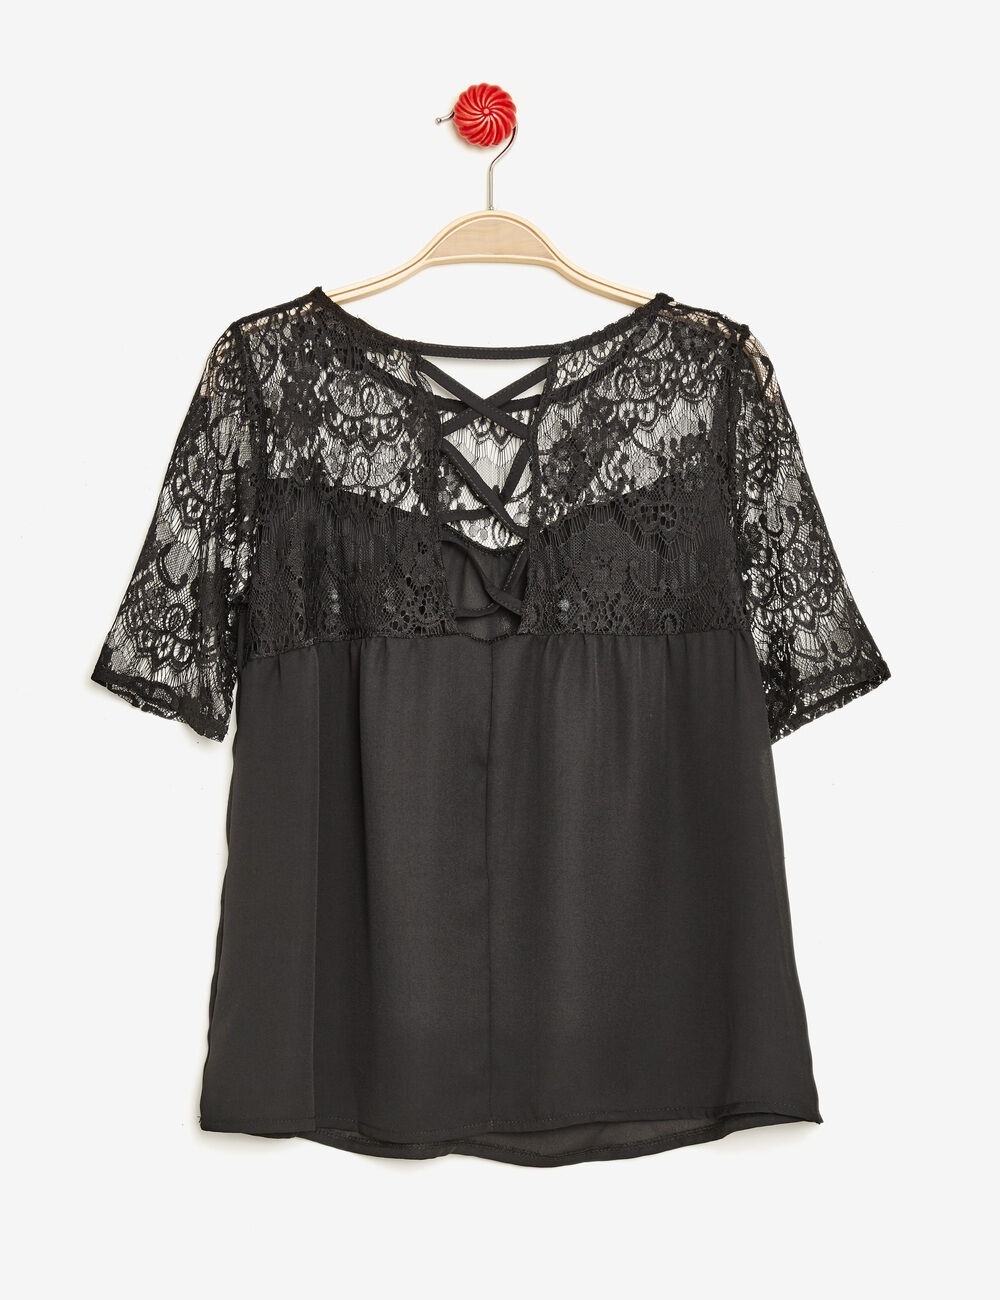 blouse dentelle et la age noire femme jennyfer. Black Bedroom Furniture Sets. Home Design Ideas